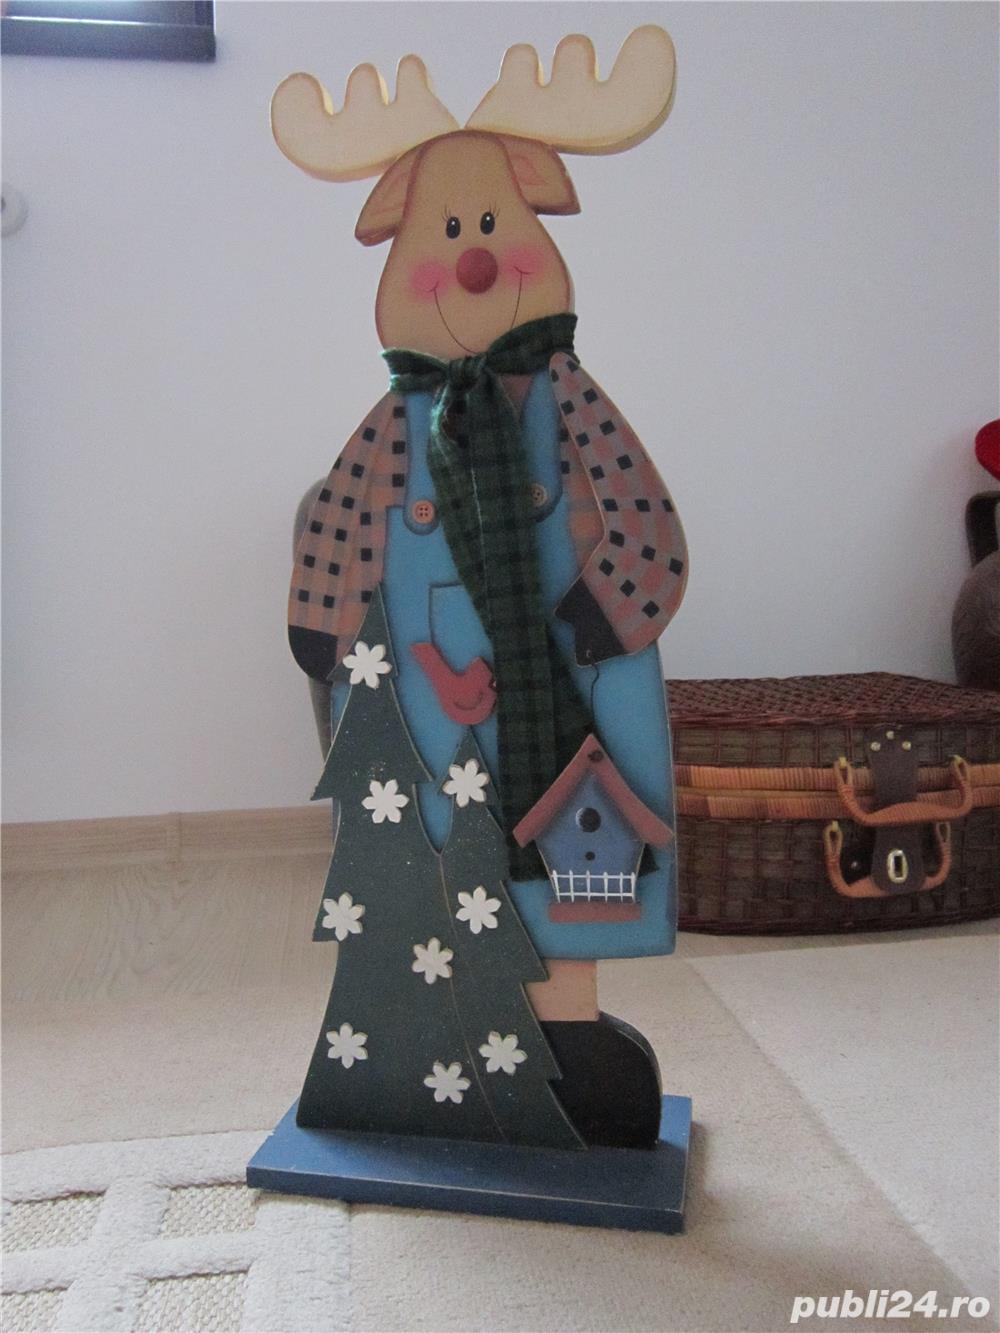 cadou inedit -Decoratiune vintage Rudolph  -mare,lemn- impecabil